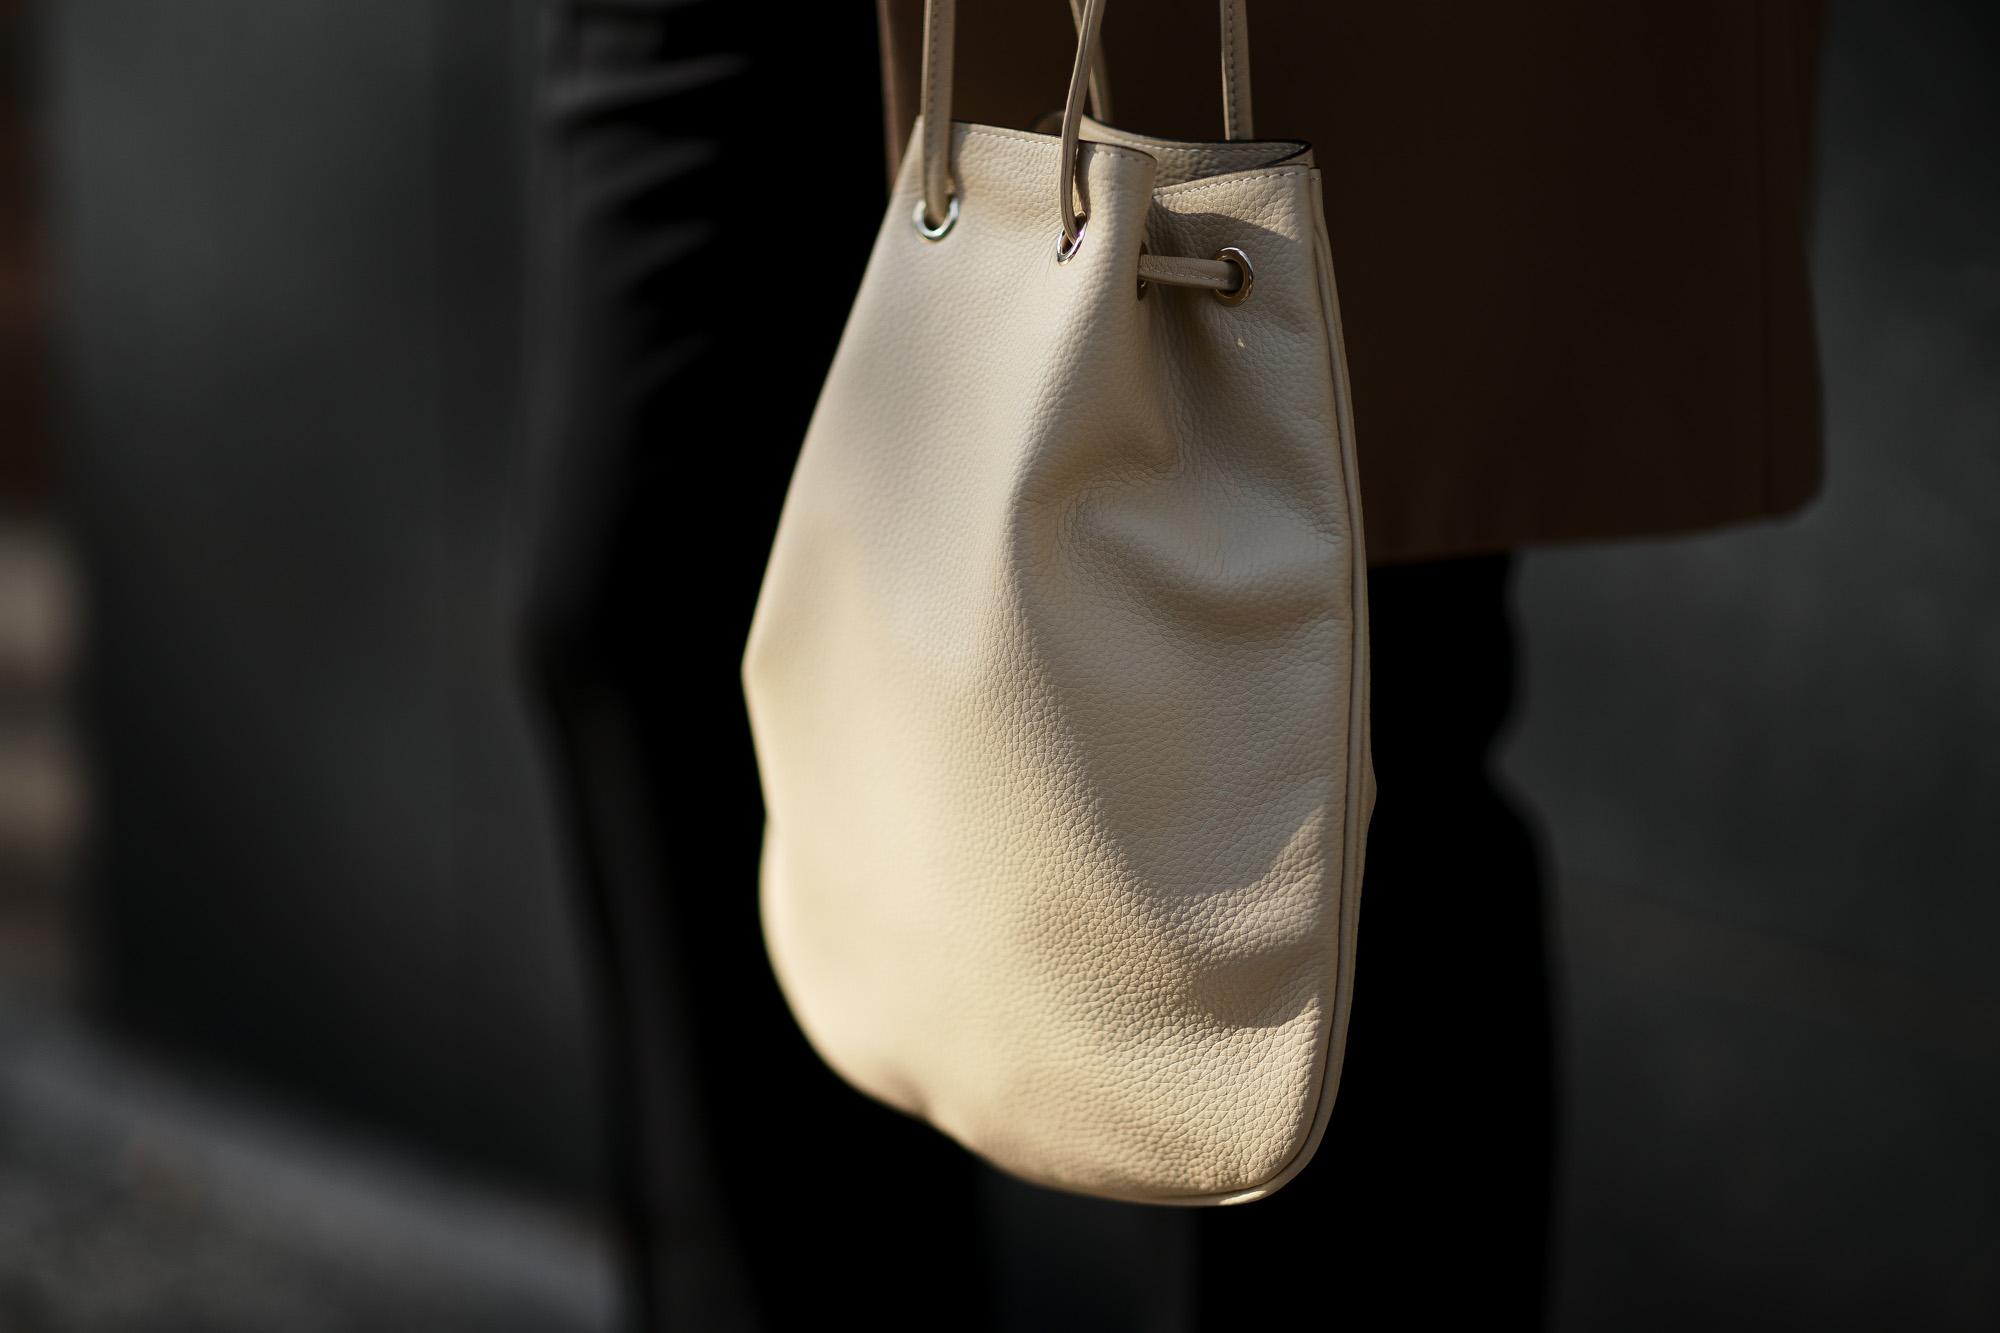 Cisei(シセイ) Drawstring Bag (ドローストリングバッグ) Lindos Leather (リンドス レザー) レザードローストリングバック 巾着 BEIGE (ベージュ) Made in italy (イタリア製) 2020春夏新作 愛知 名古屋 altoediritto アルトデリット きんちゃく レザーバック